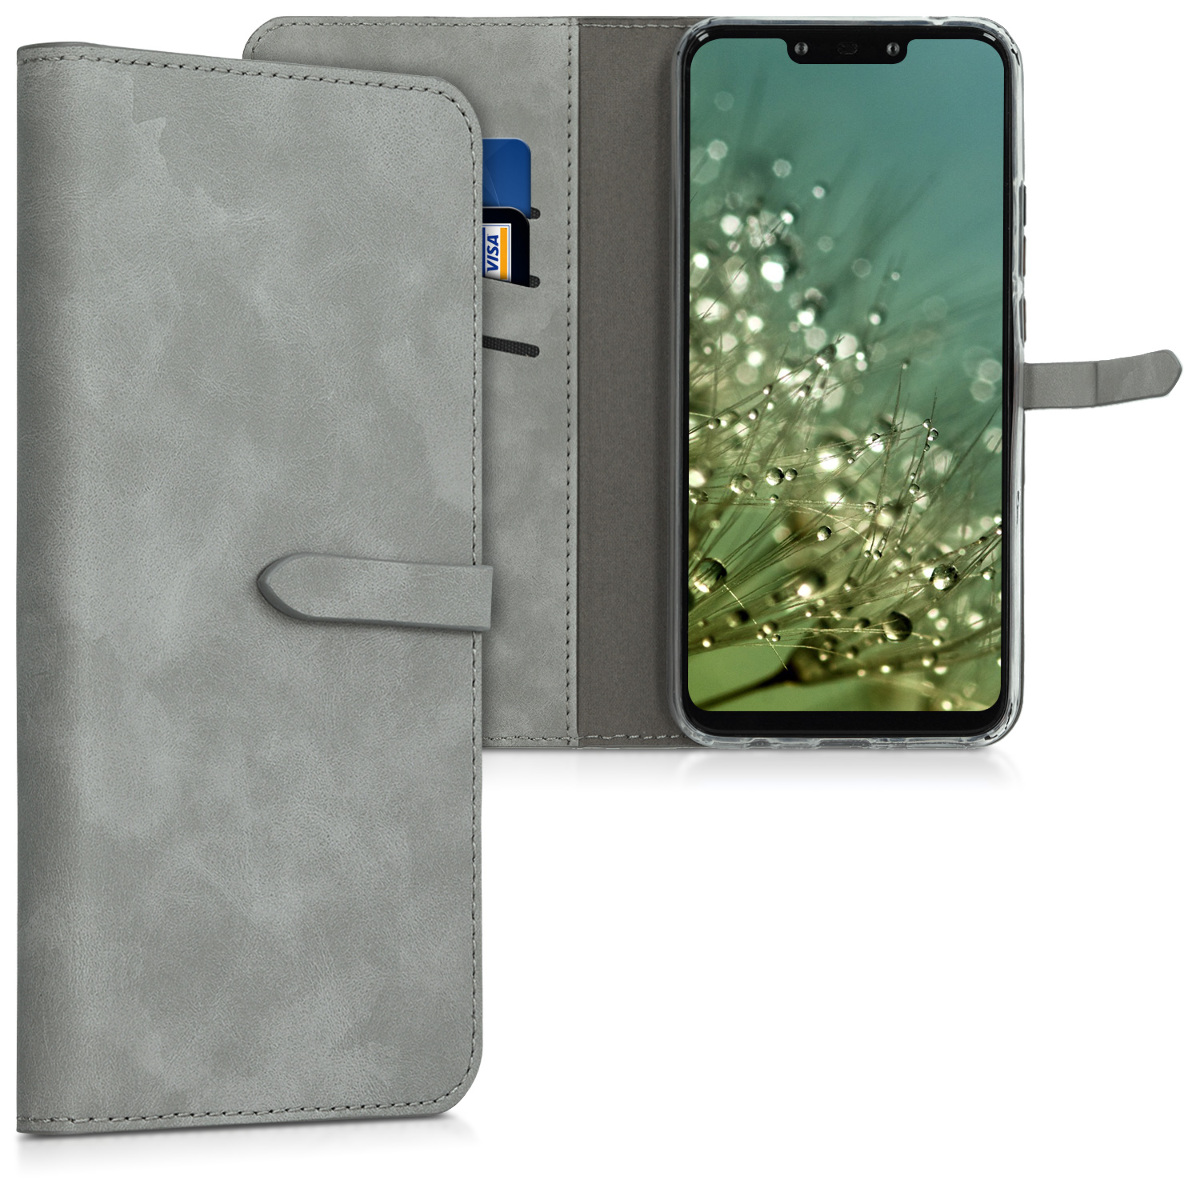 KW Θήκη Πορτοφόλι Huawei Mate 20 Lite - Grey (47007.22)